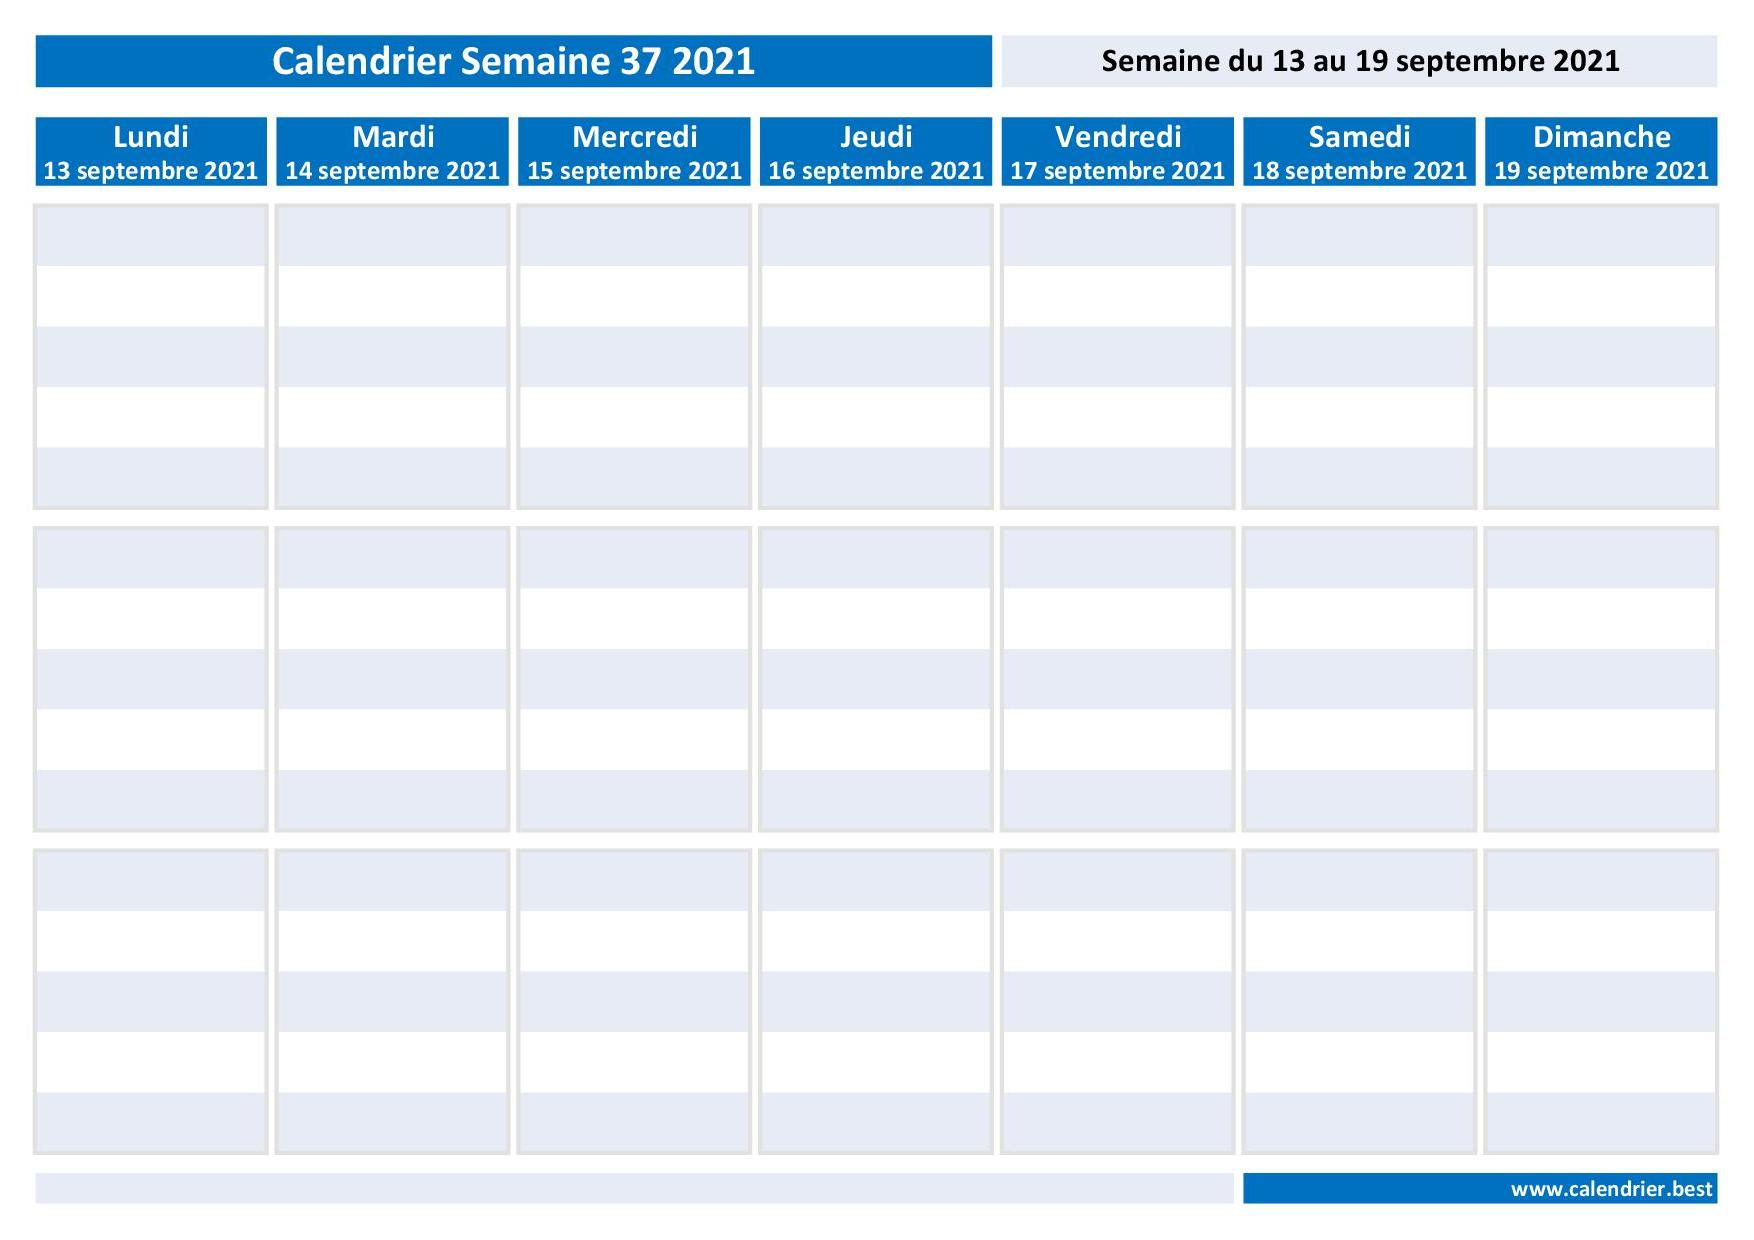 Semaine 37 2021 : dates, calendrier et planning  Calendrier.best